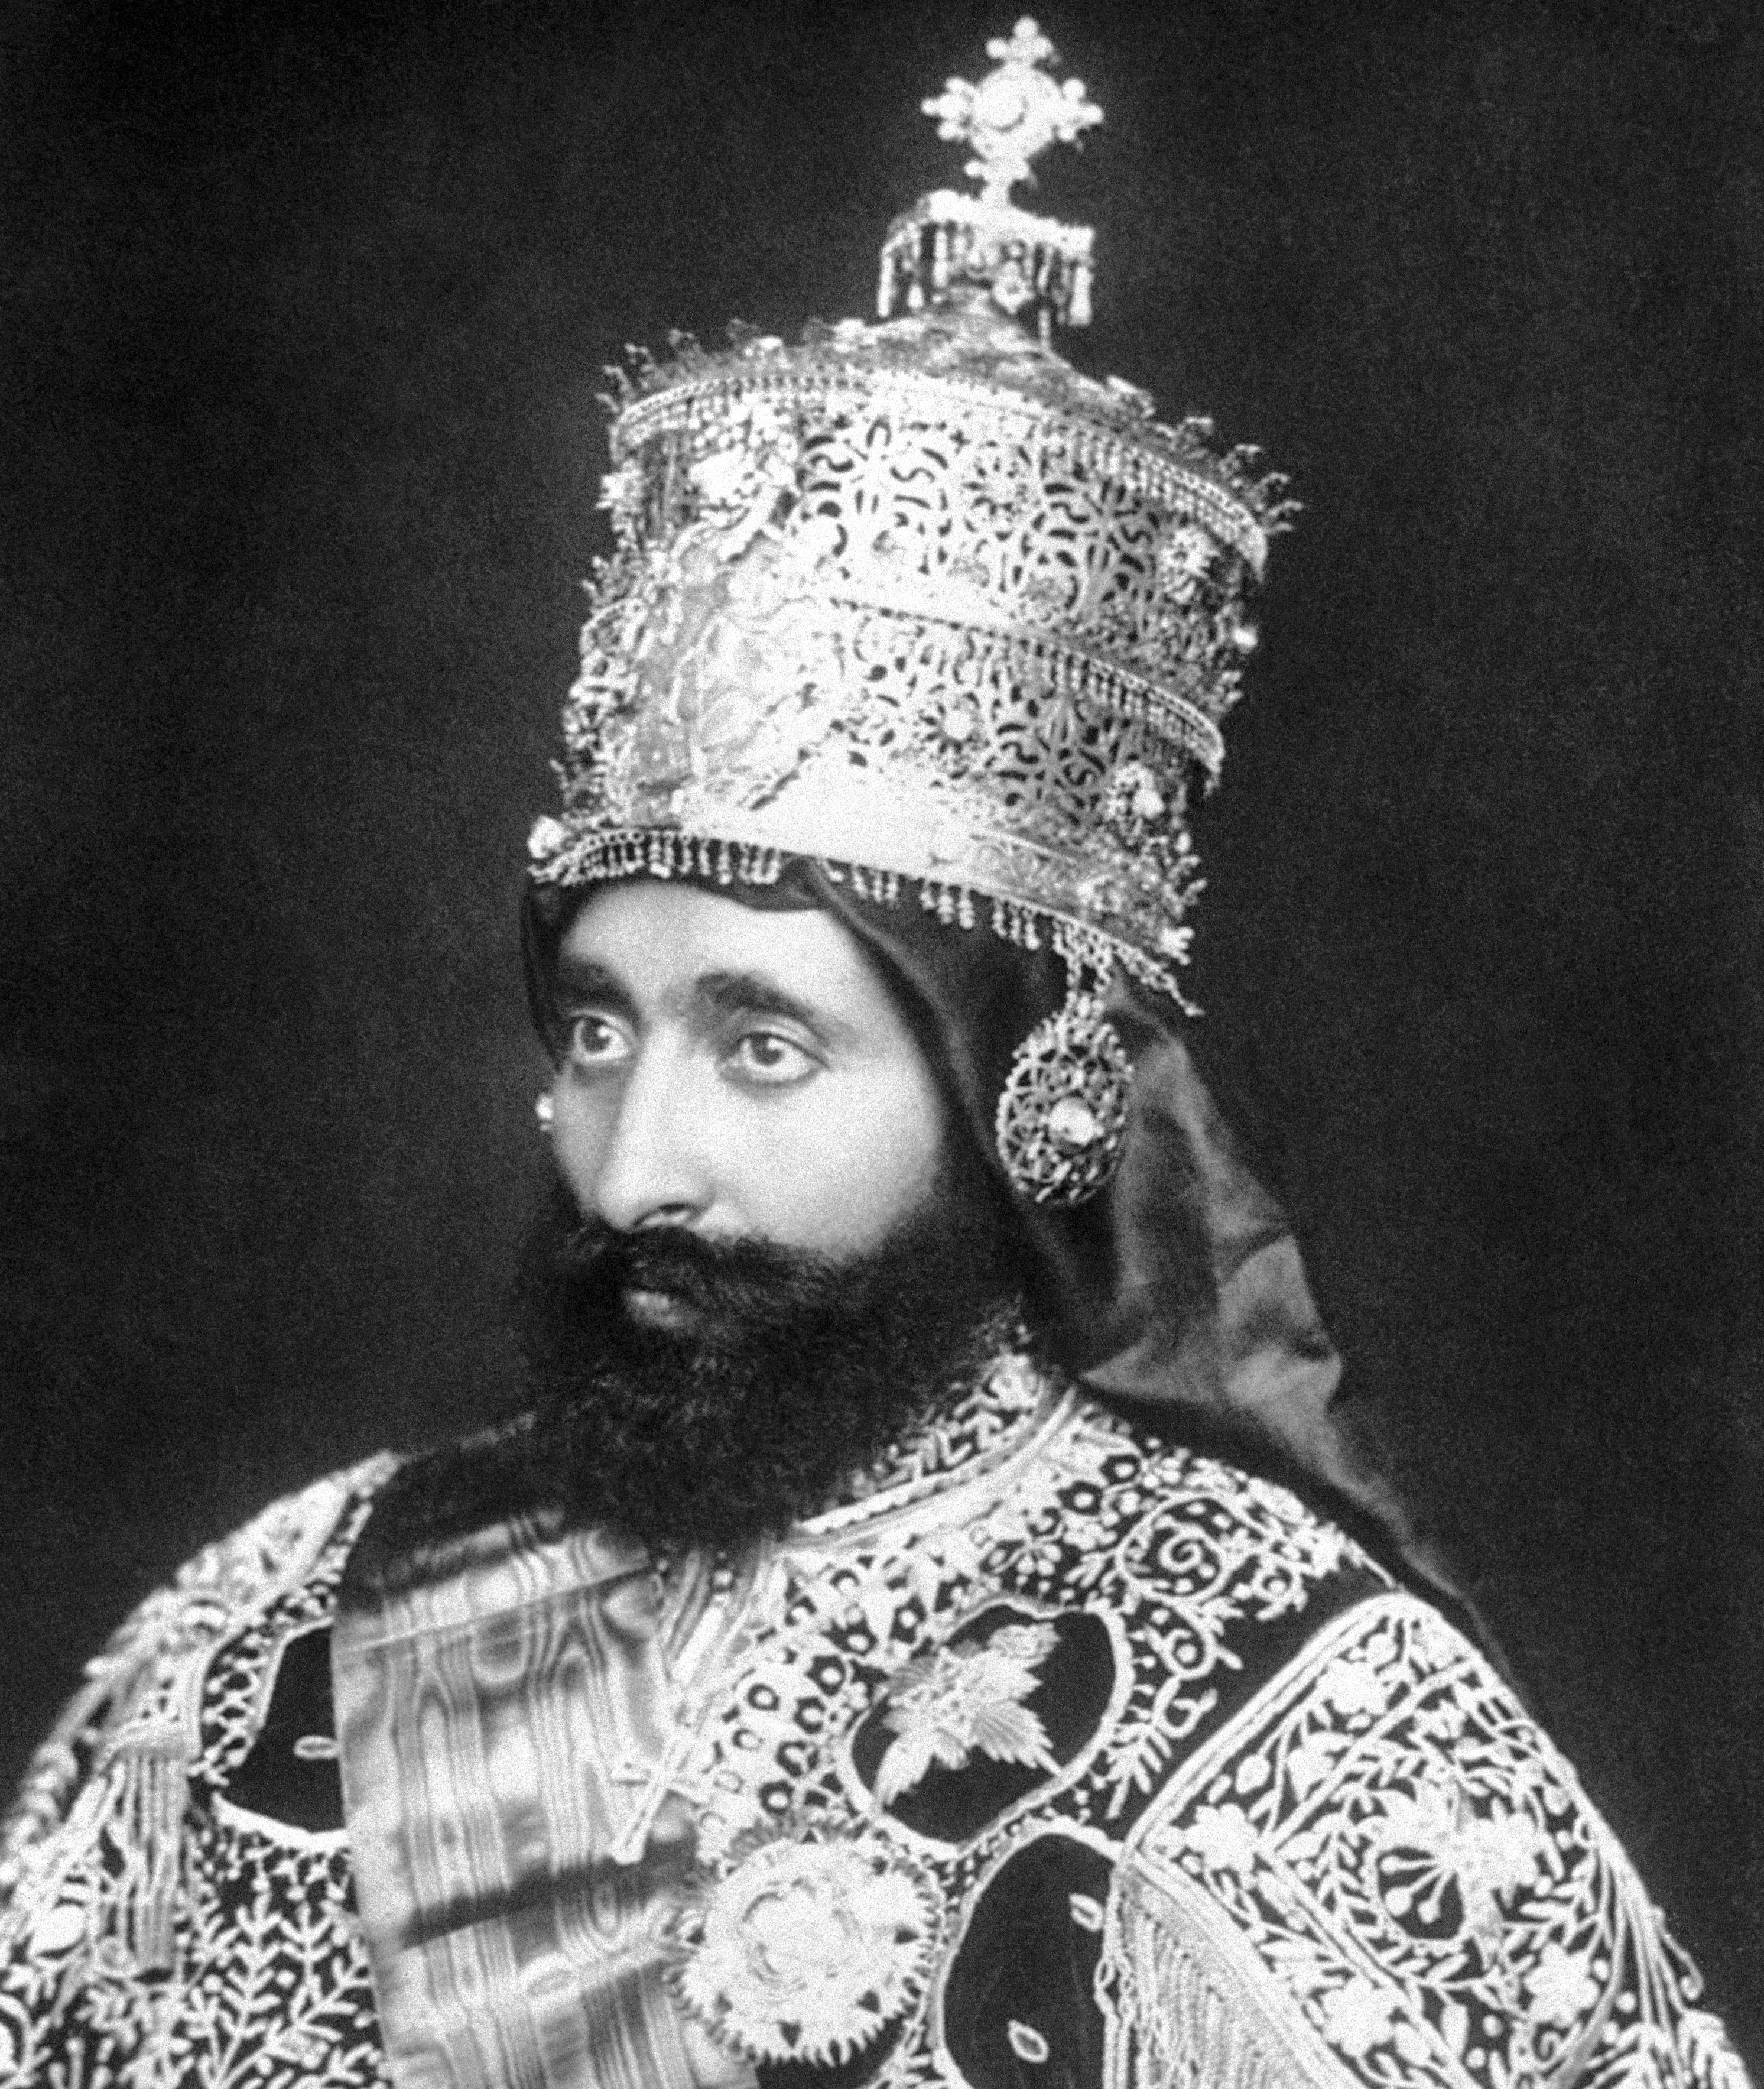 Emperor Ras Tafari. (Credit: Bettmann Archive/Getty Images)